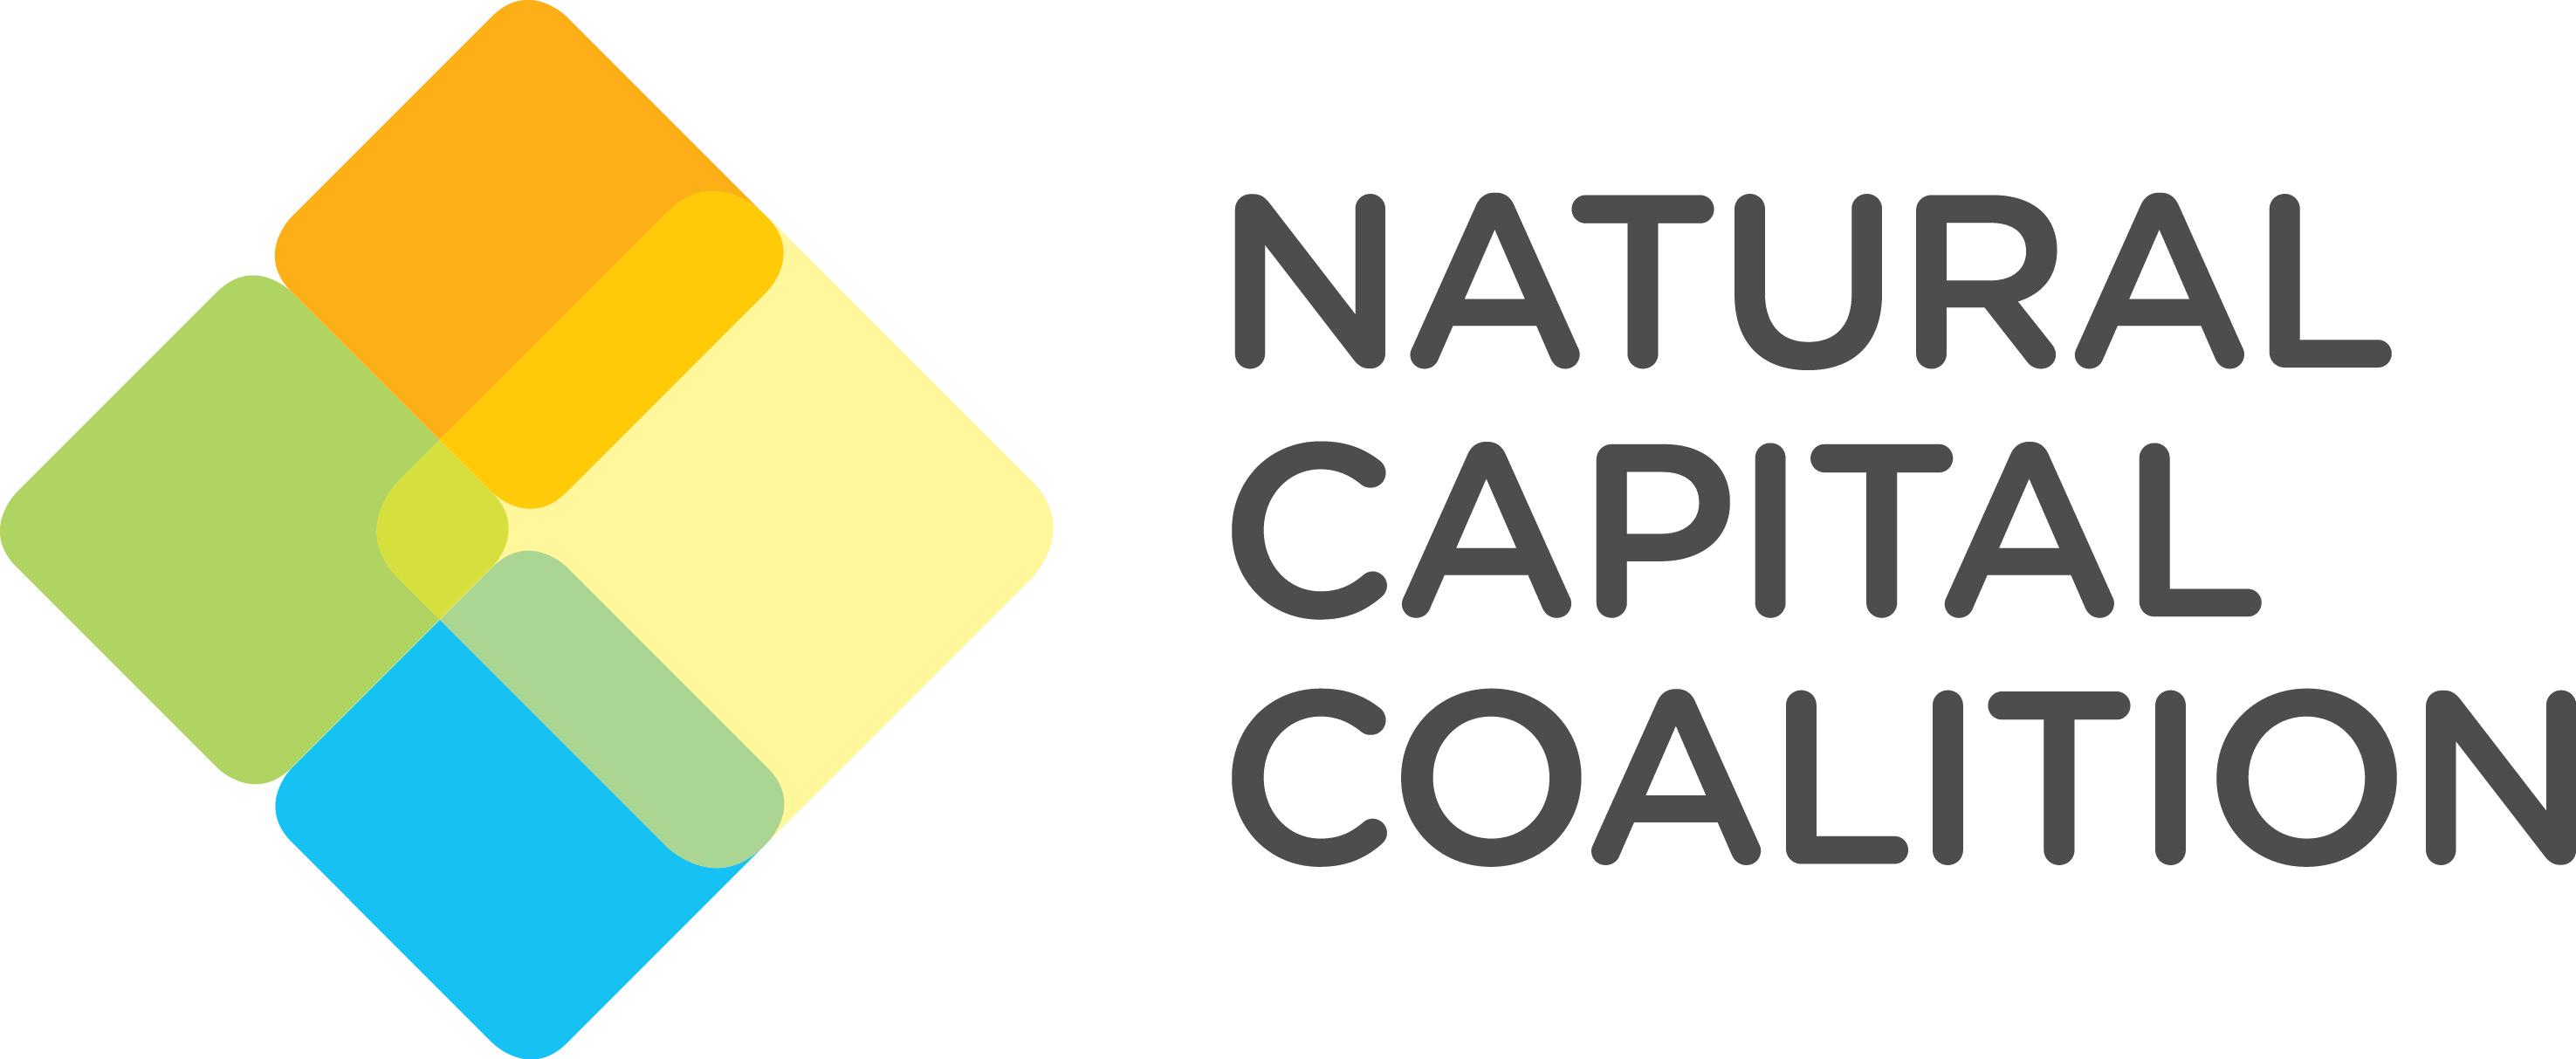 Image natural capital coalition